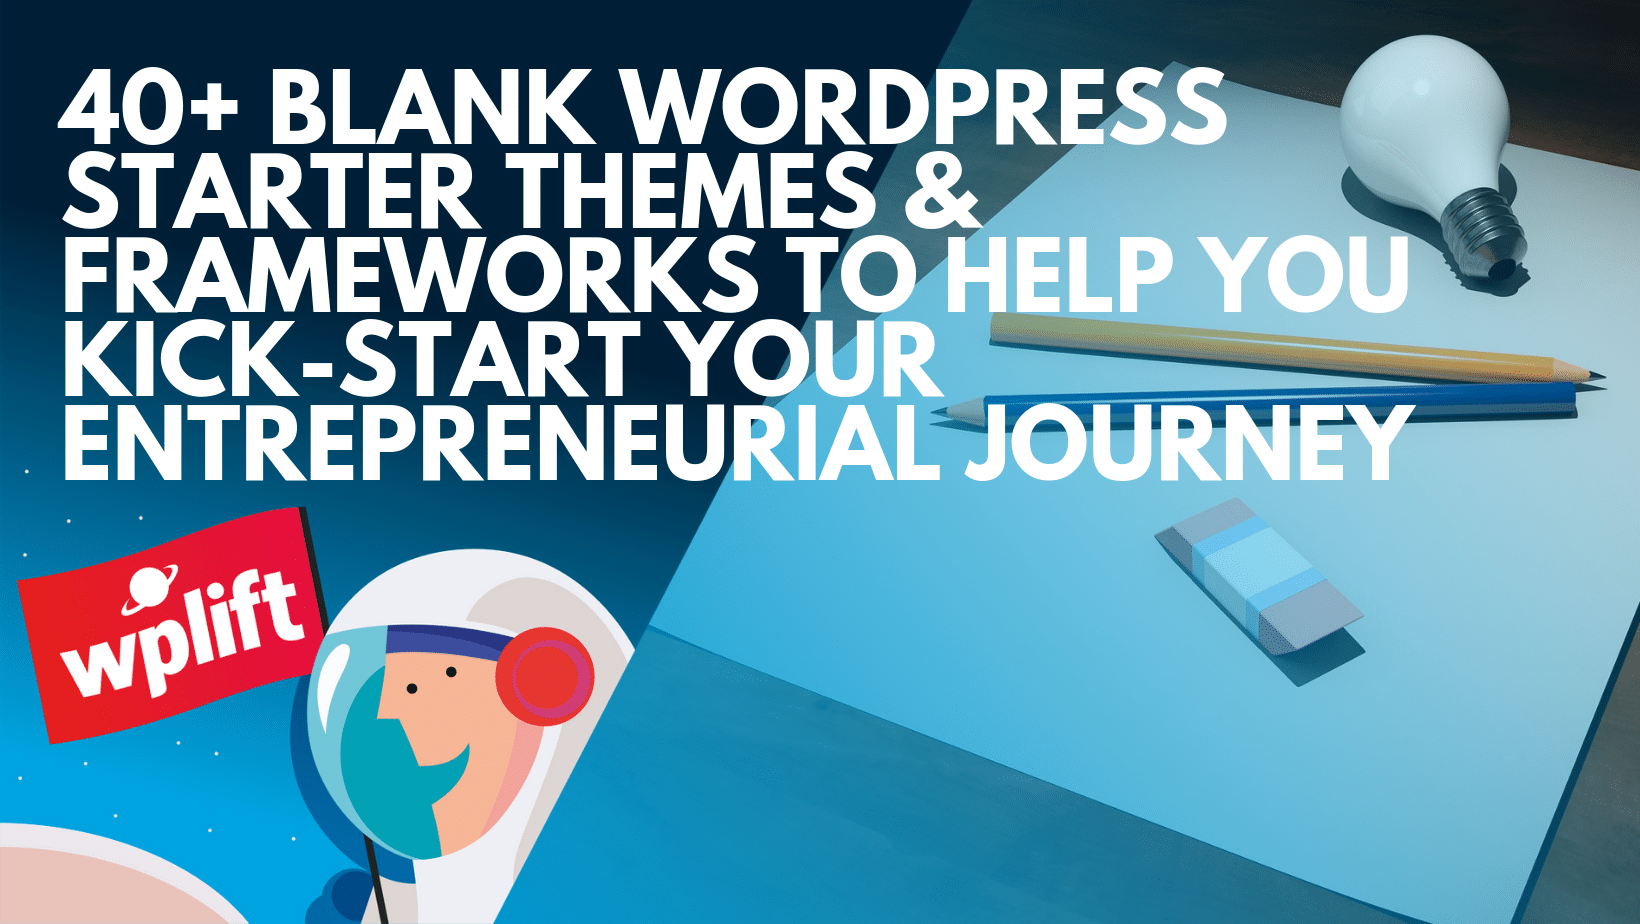 40+ Blank WordPress Starter Themes & Frameworks